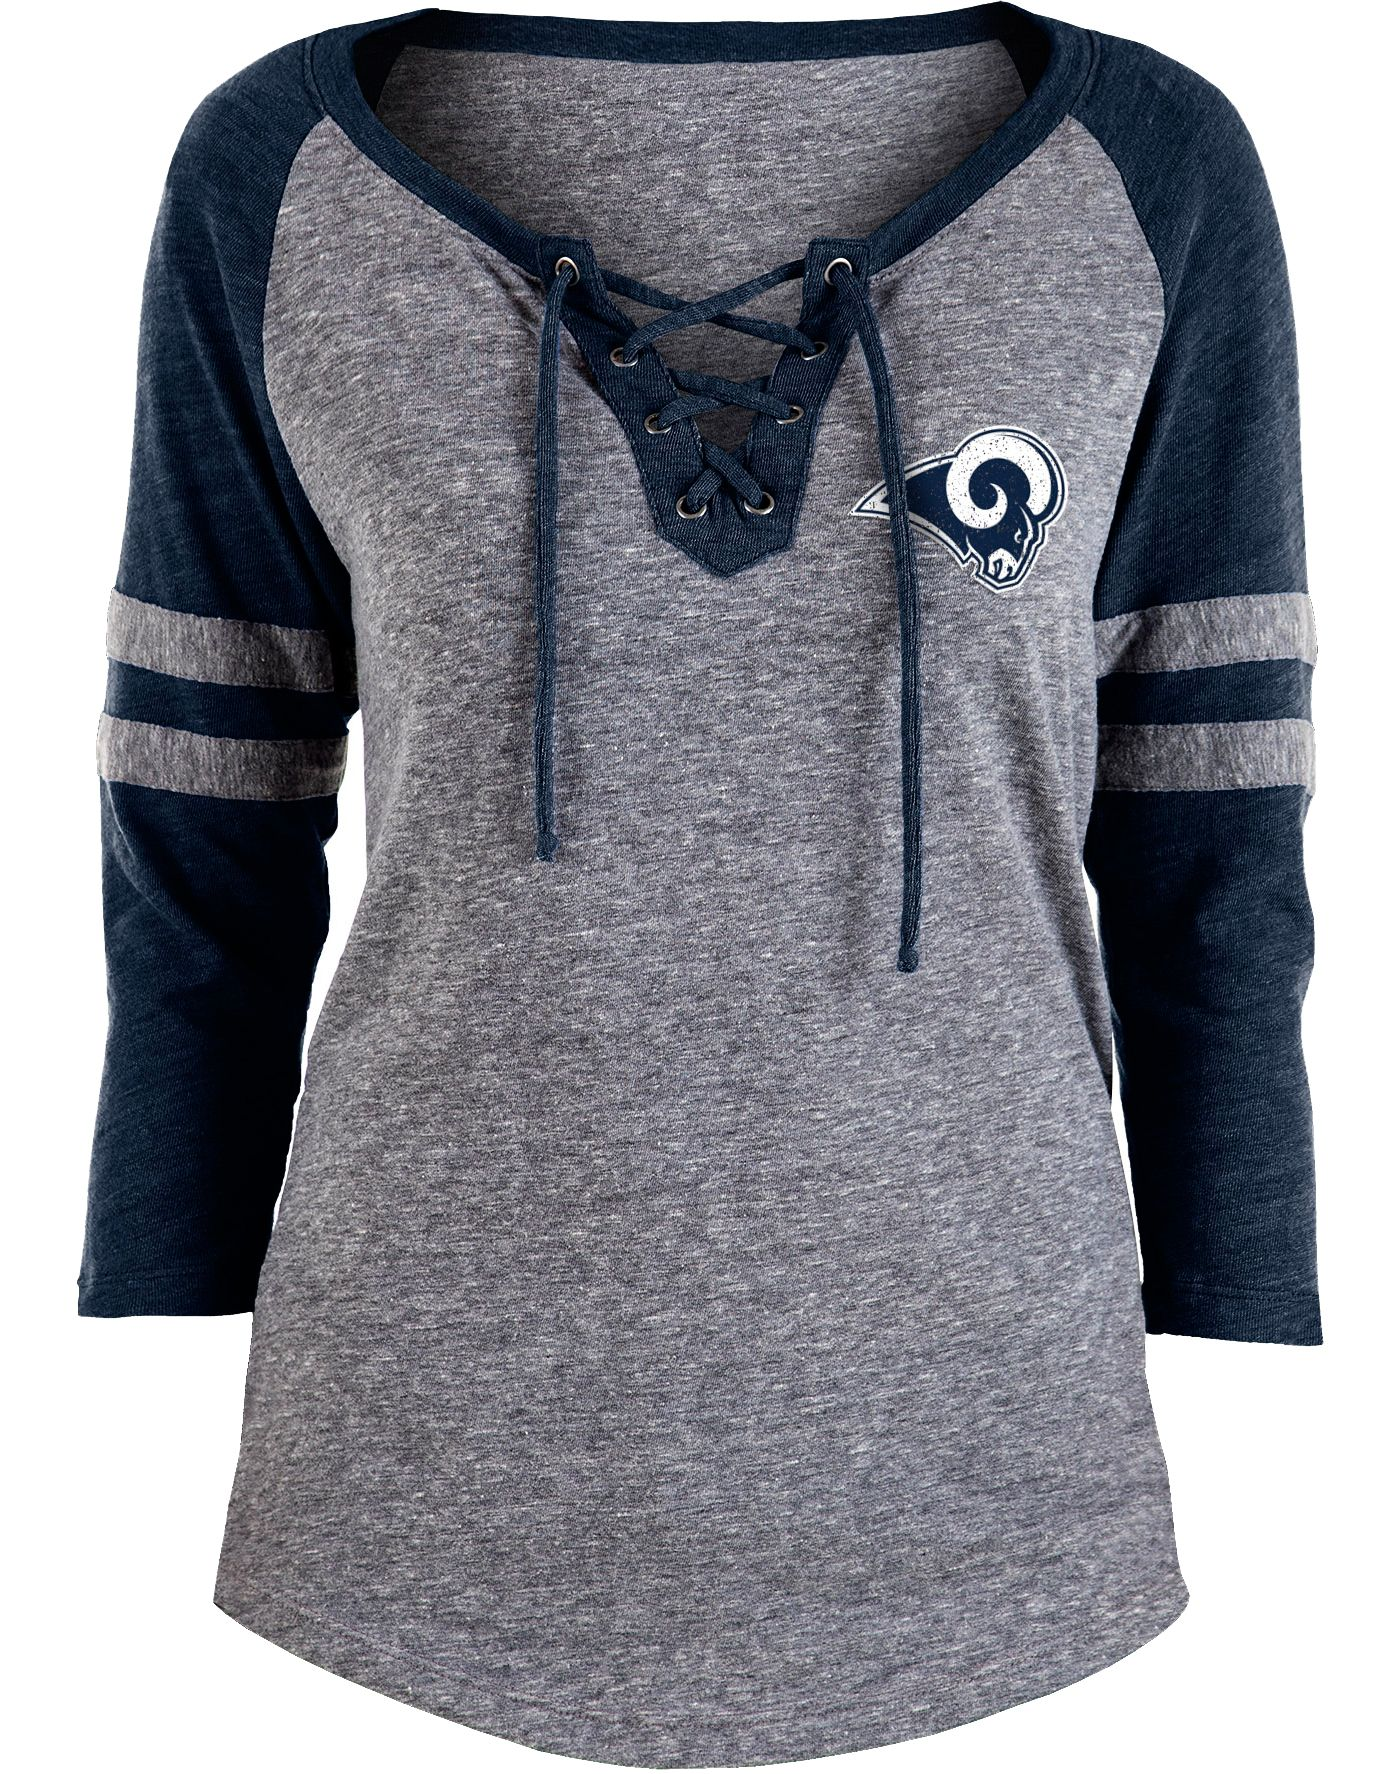 NFL Team Apparel Women's Los Angeles Rams Trilace Grey Raglan Shirt